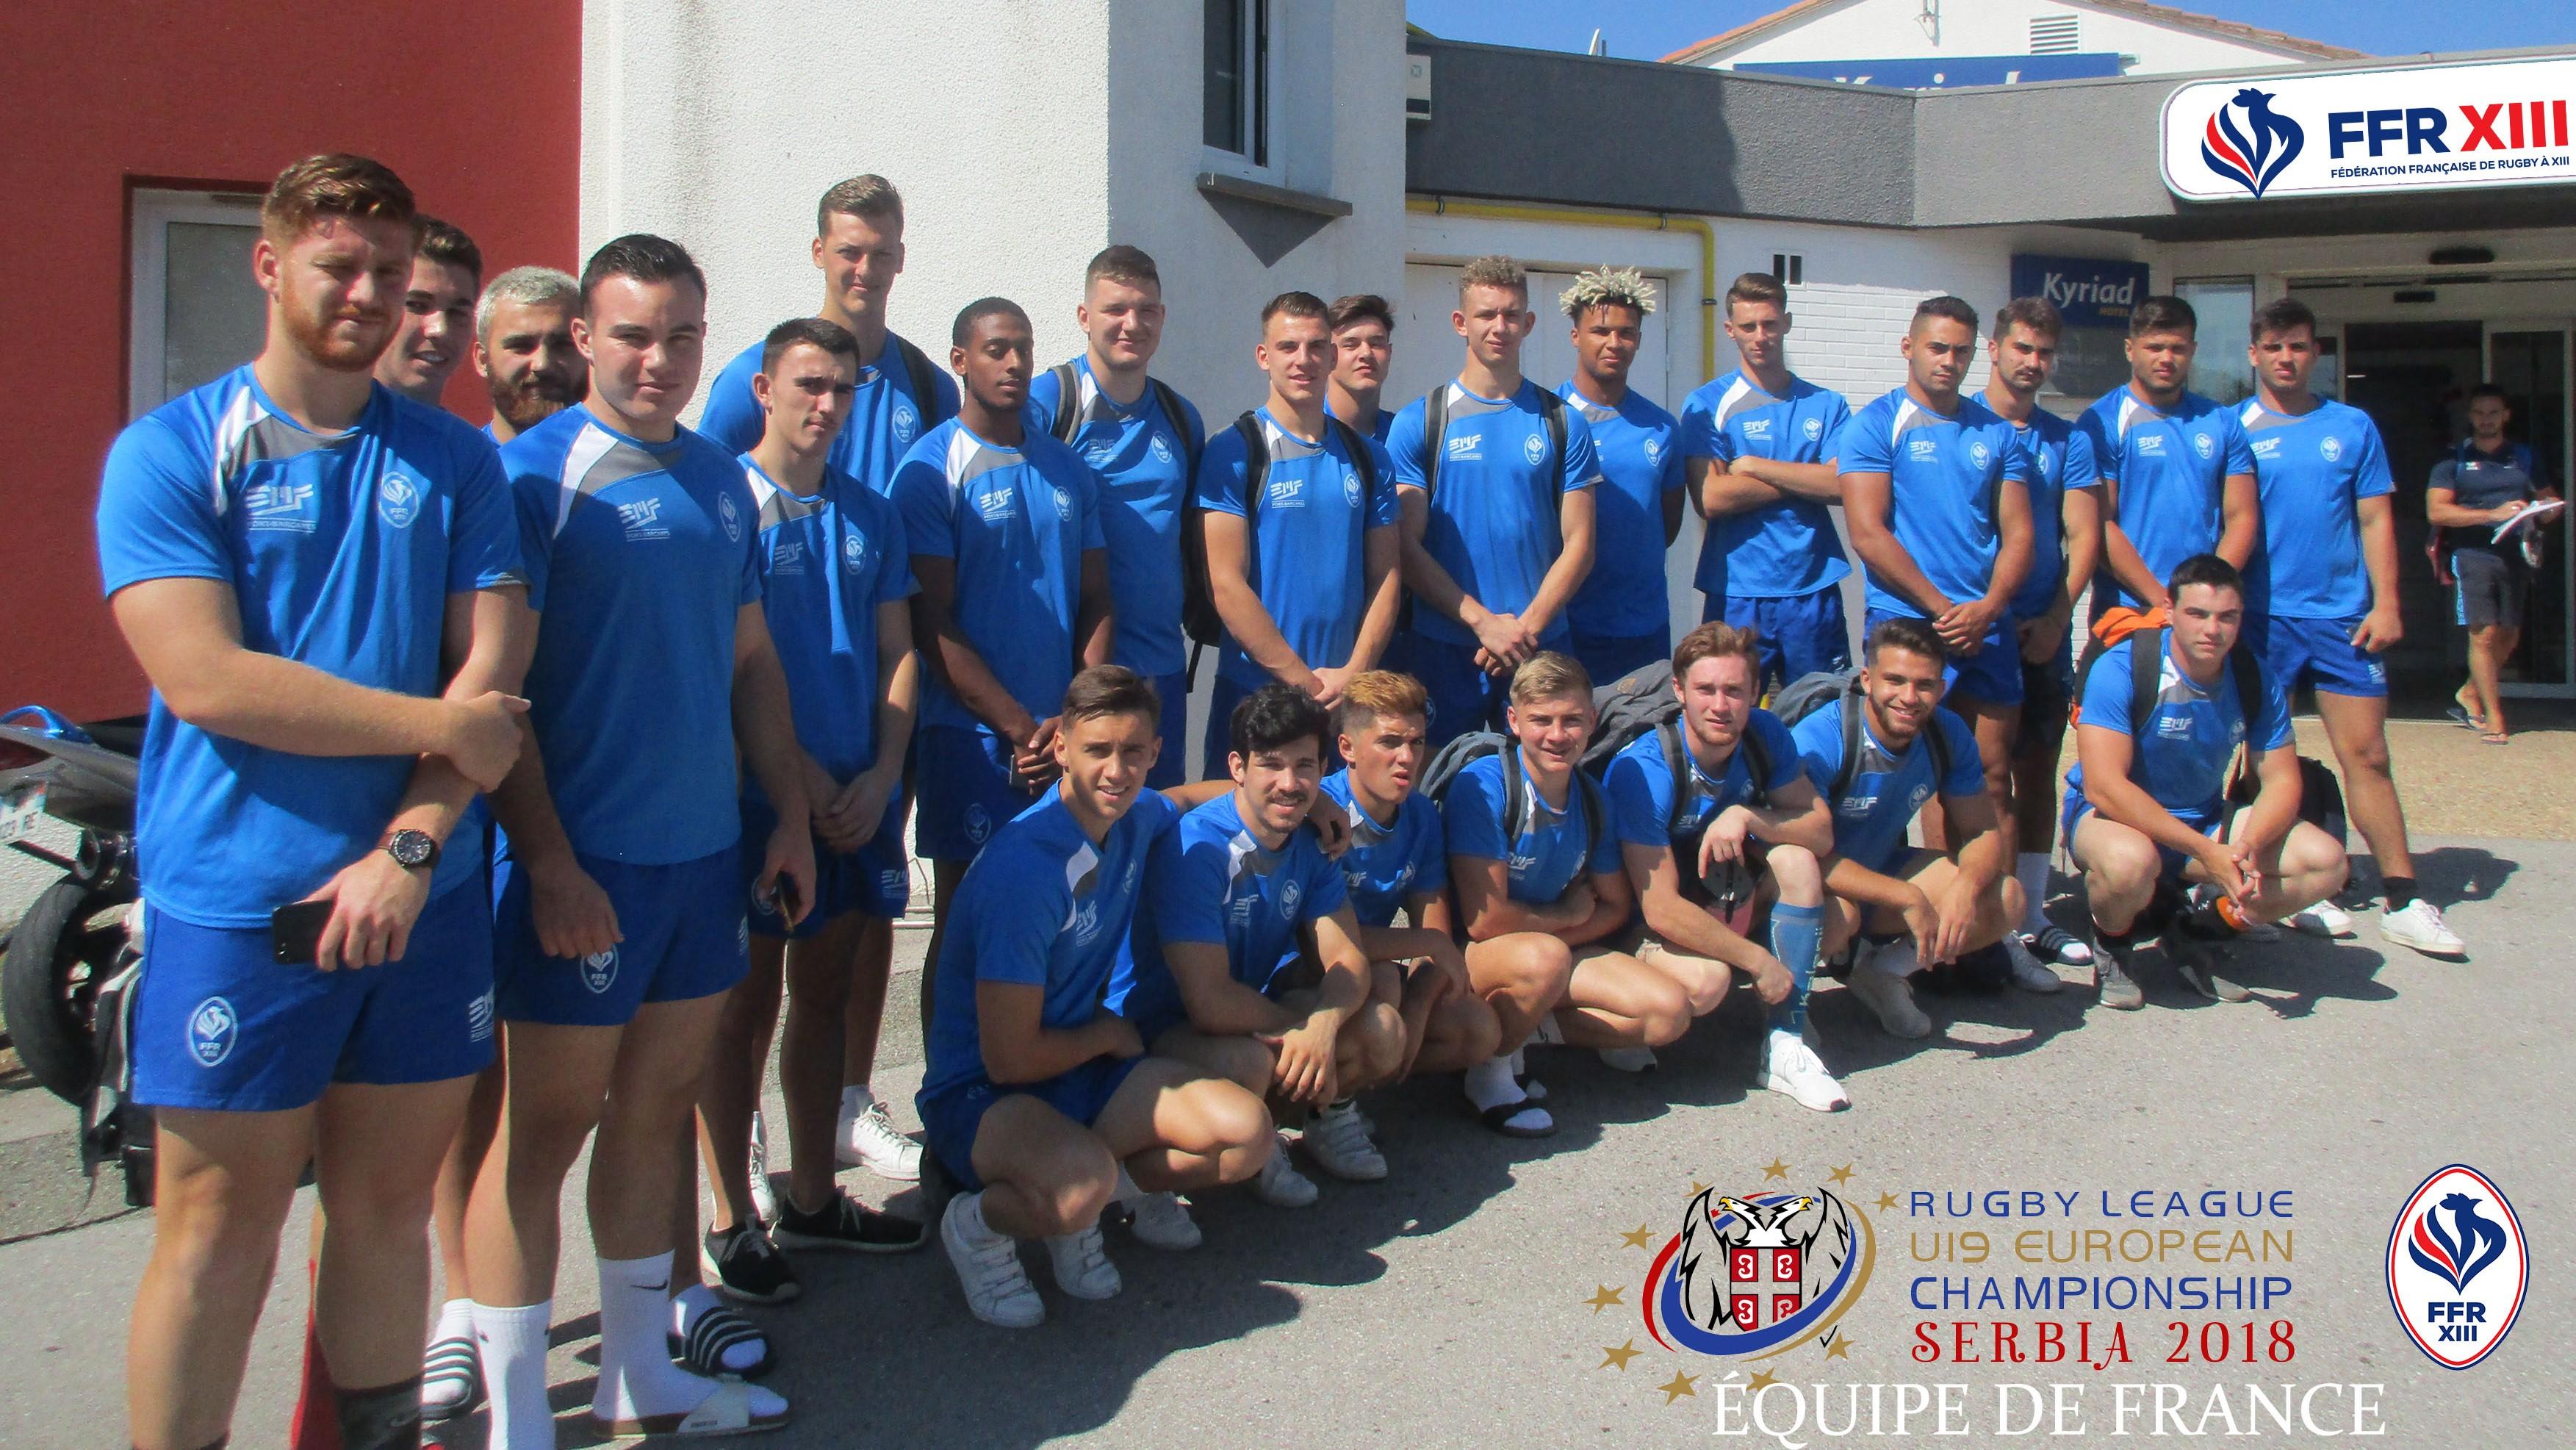 U19 Equipe de France Serbie 2018